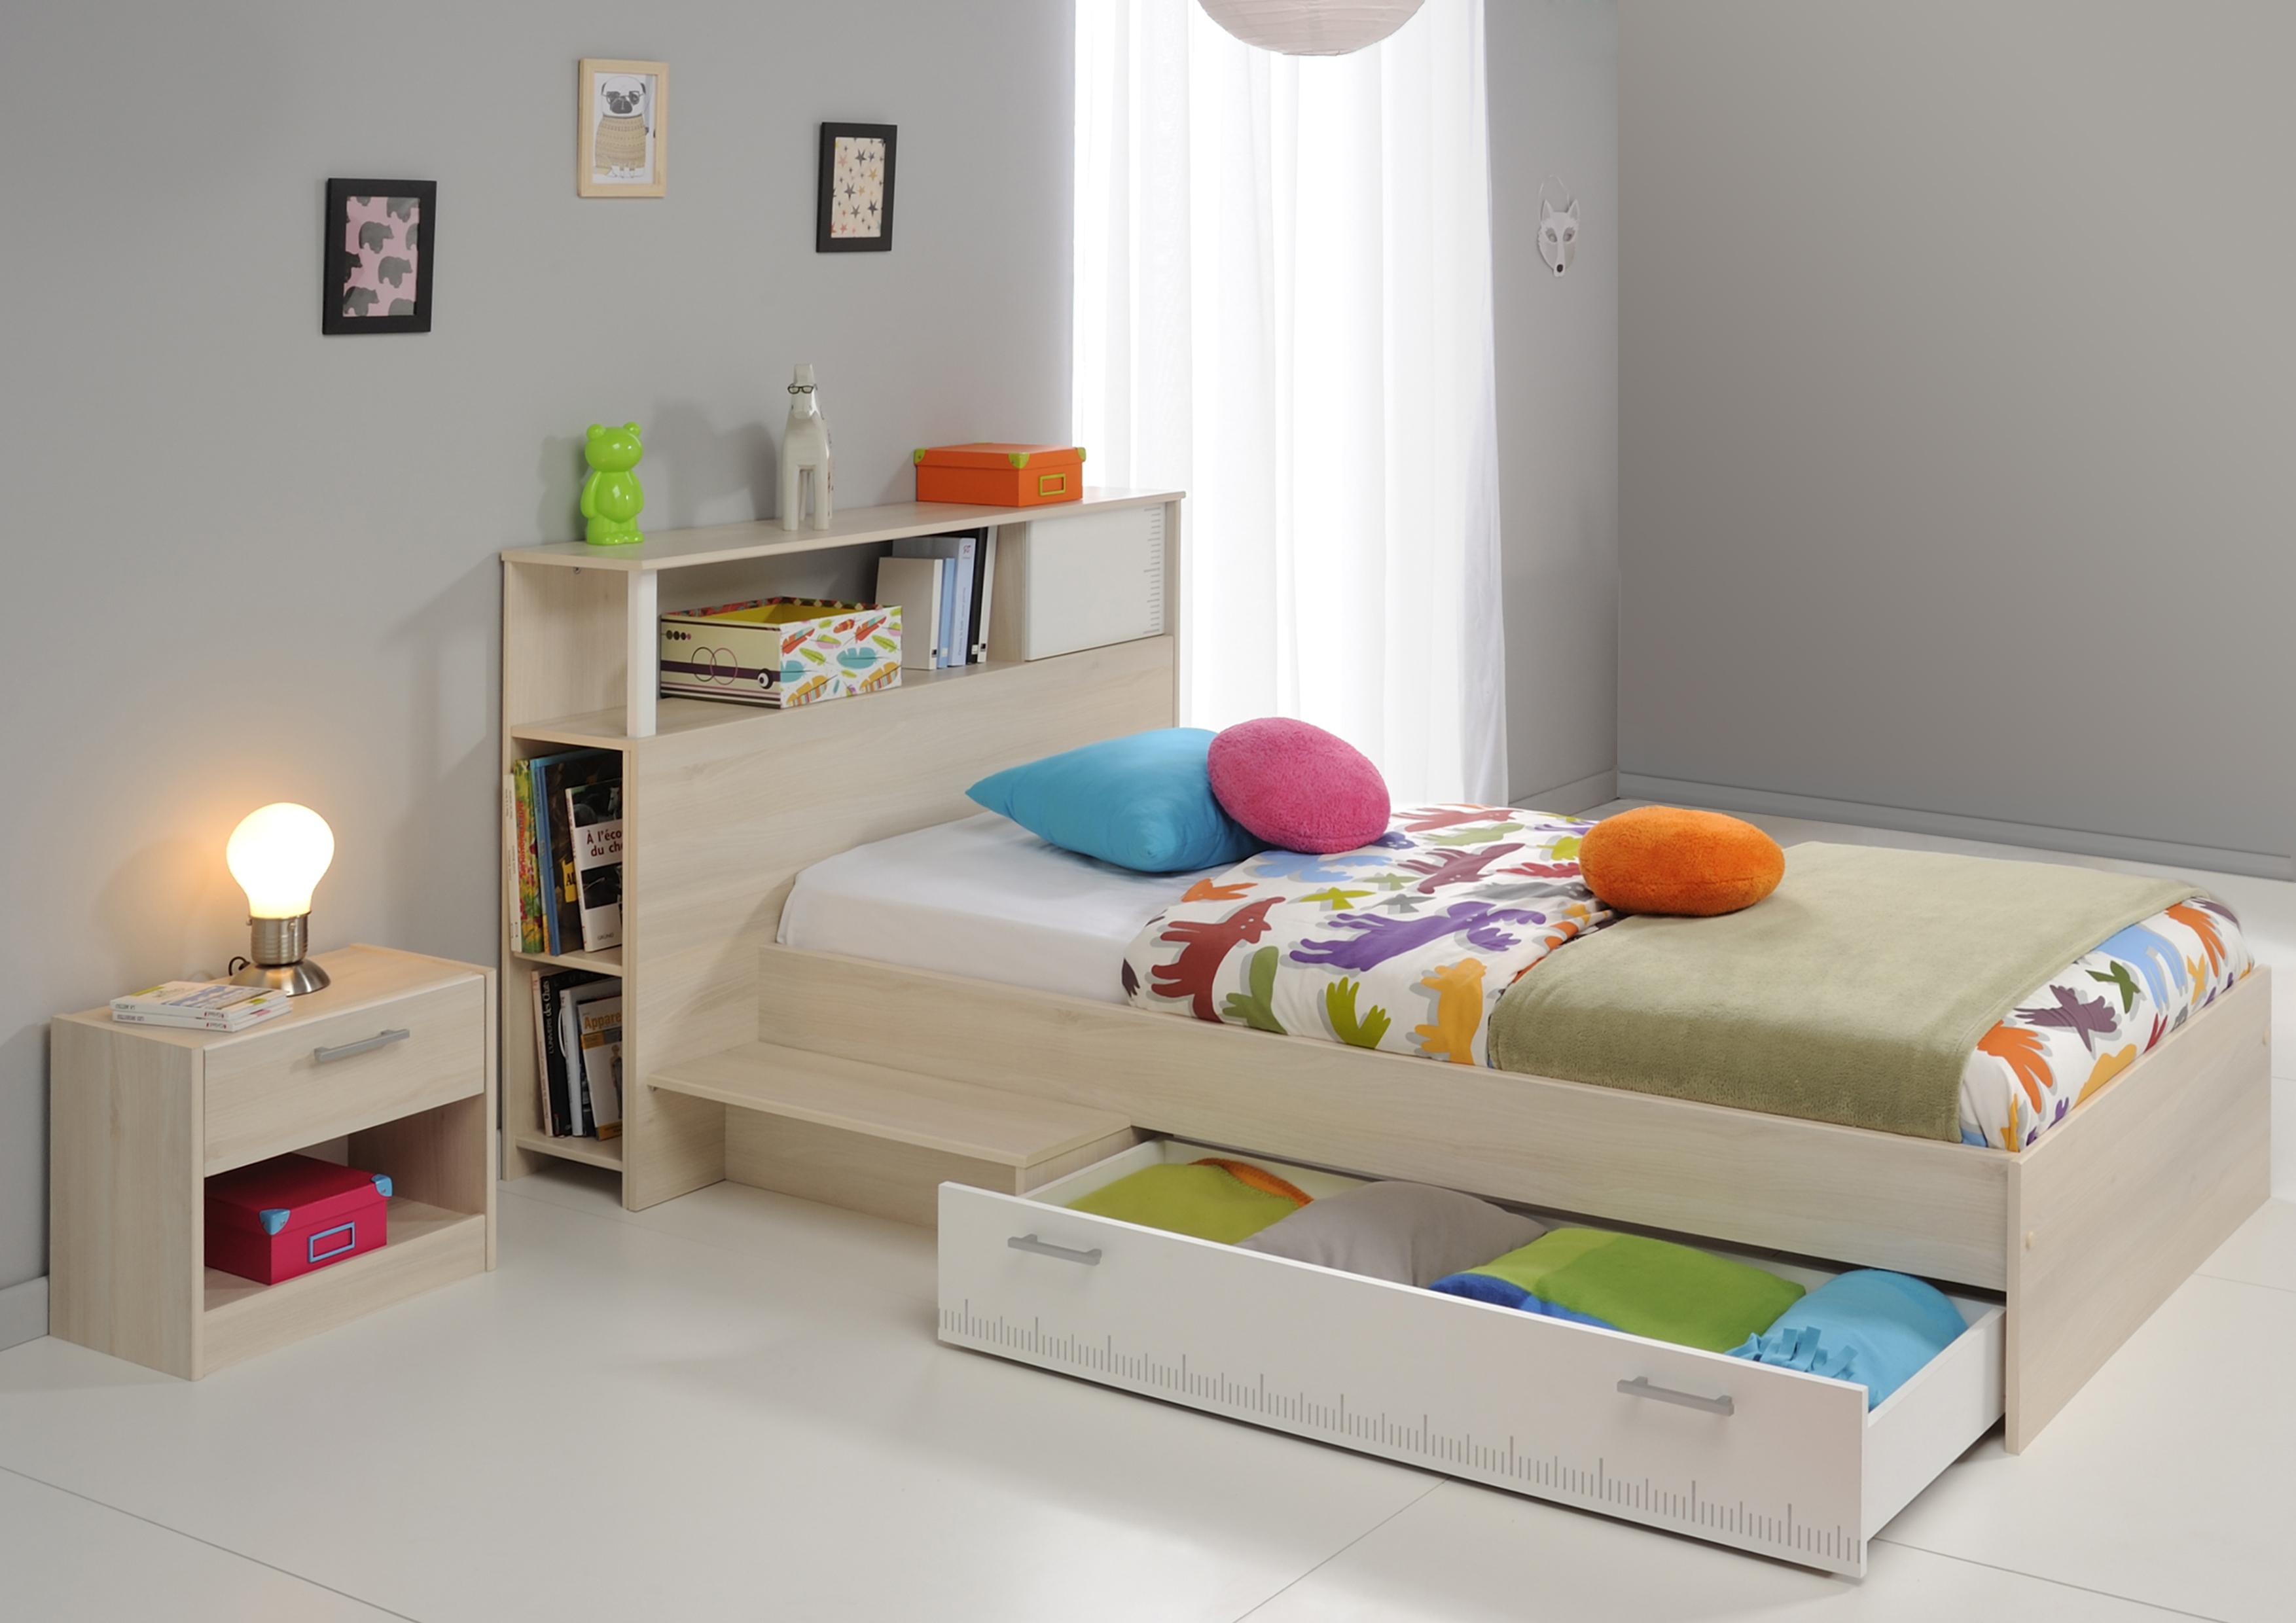 Kinderzimmer Set 3-tlg Akazie/Weiß